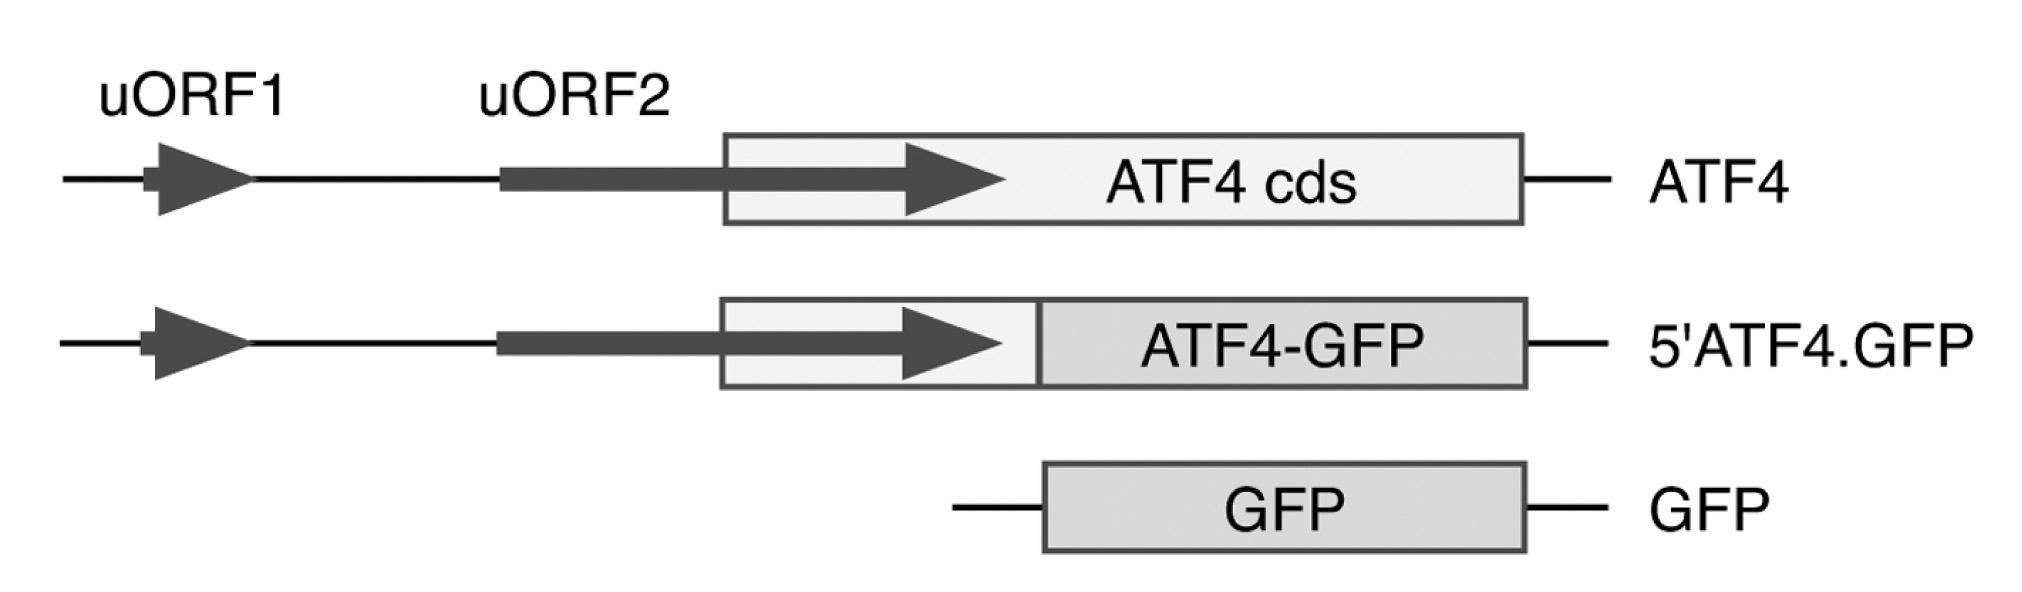 Addgene: ATF4 5: 5'ATF4 GFP